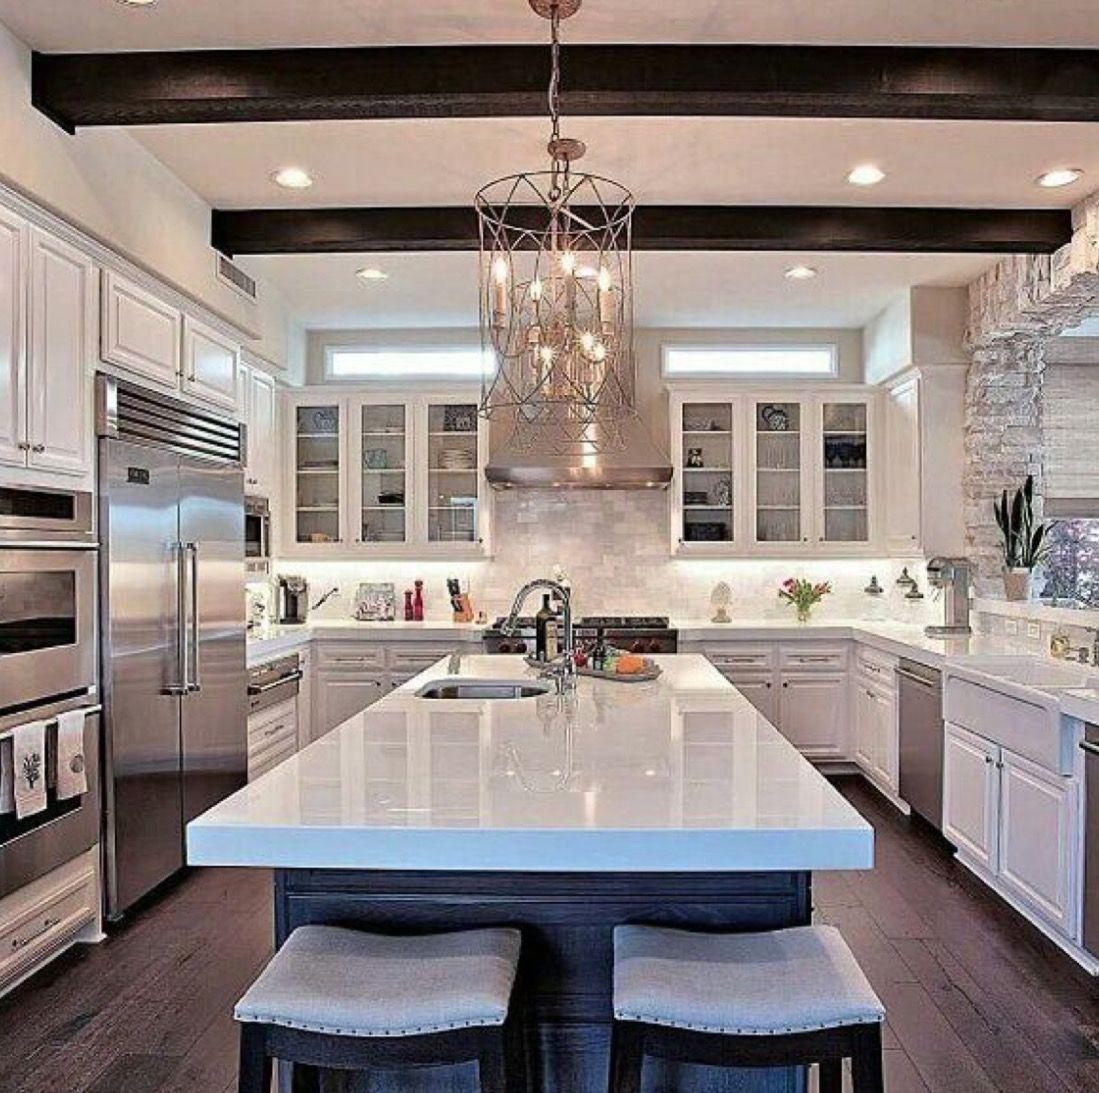 Unique Small Kitchen Island Ideas To Try: Large, Spacious White Open Kitchen With White Granite